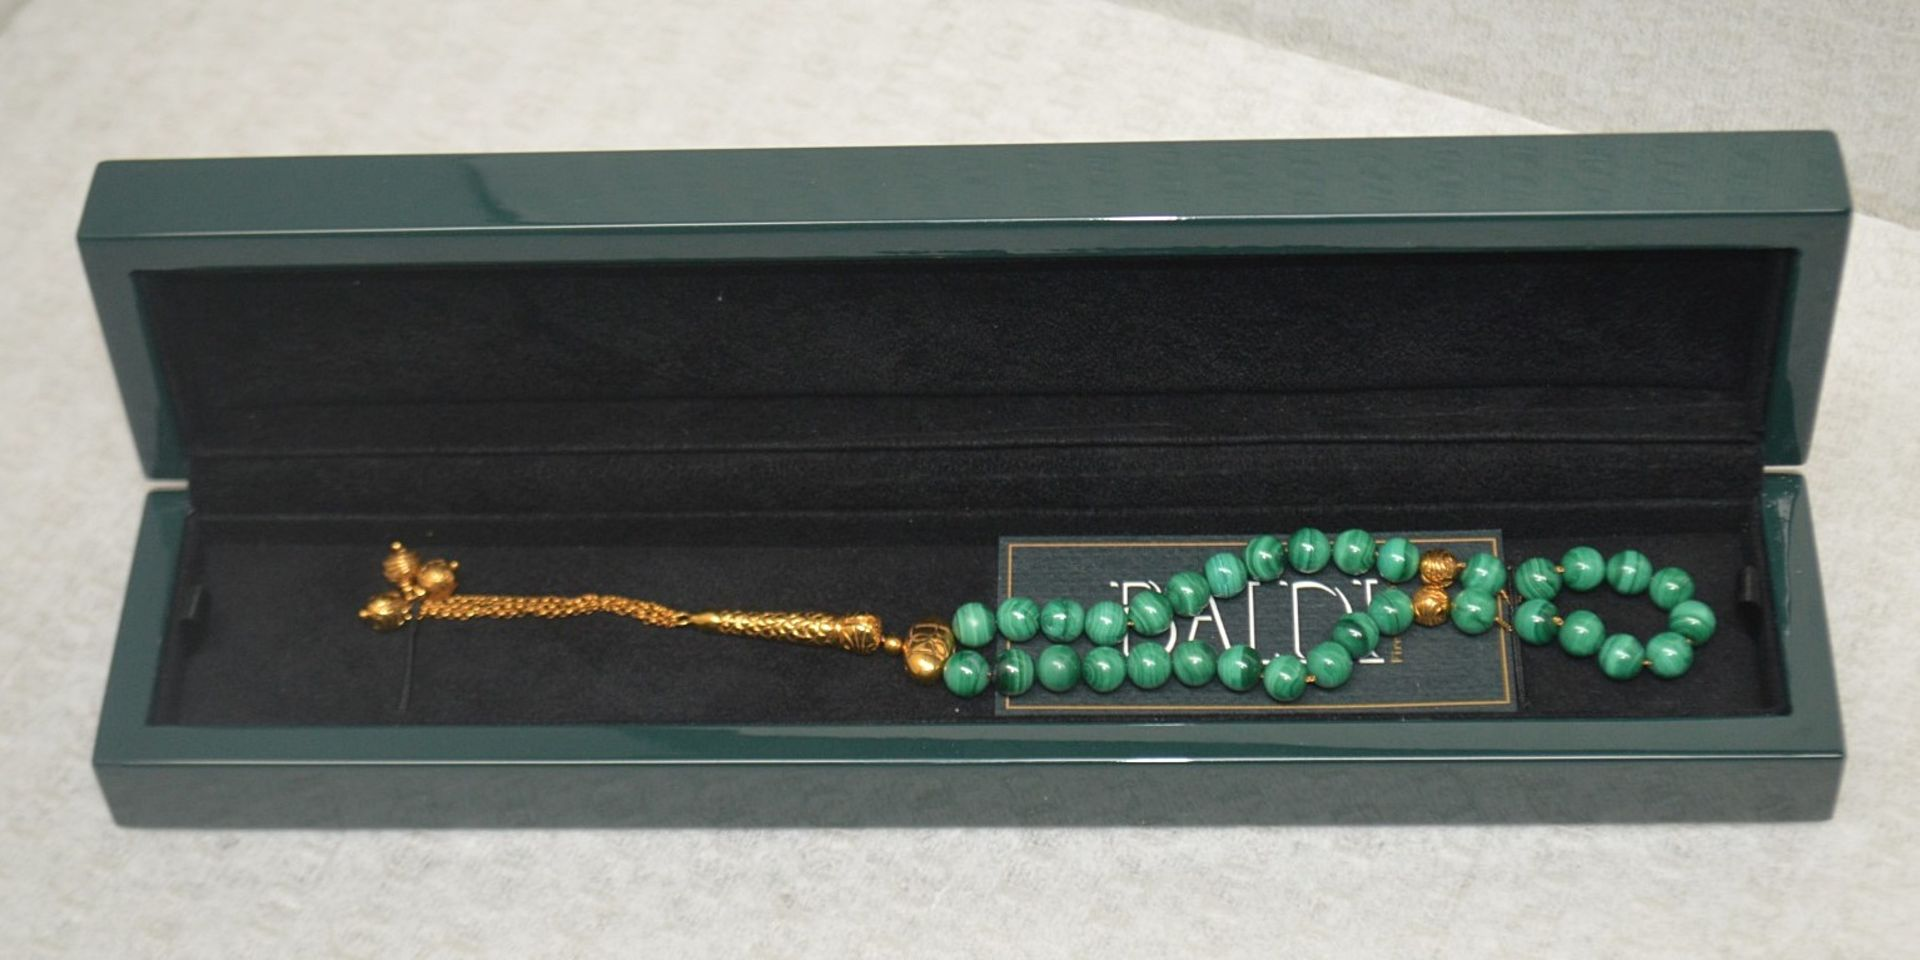 1 x BALDI 'Home Jewels' Italian Hand-crafted Artisan MISBAHA Prayer Beads In Green Malachite And